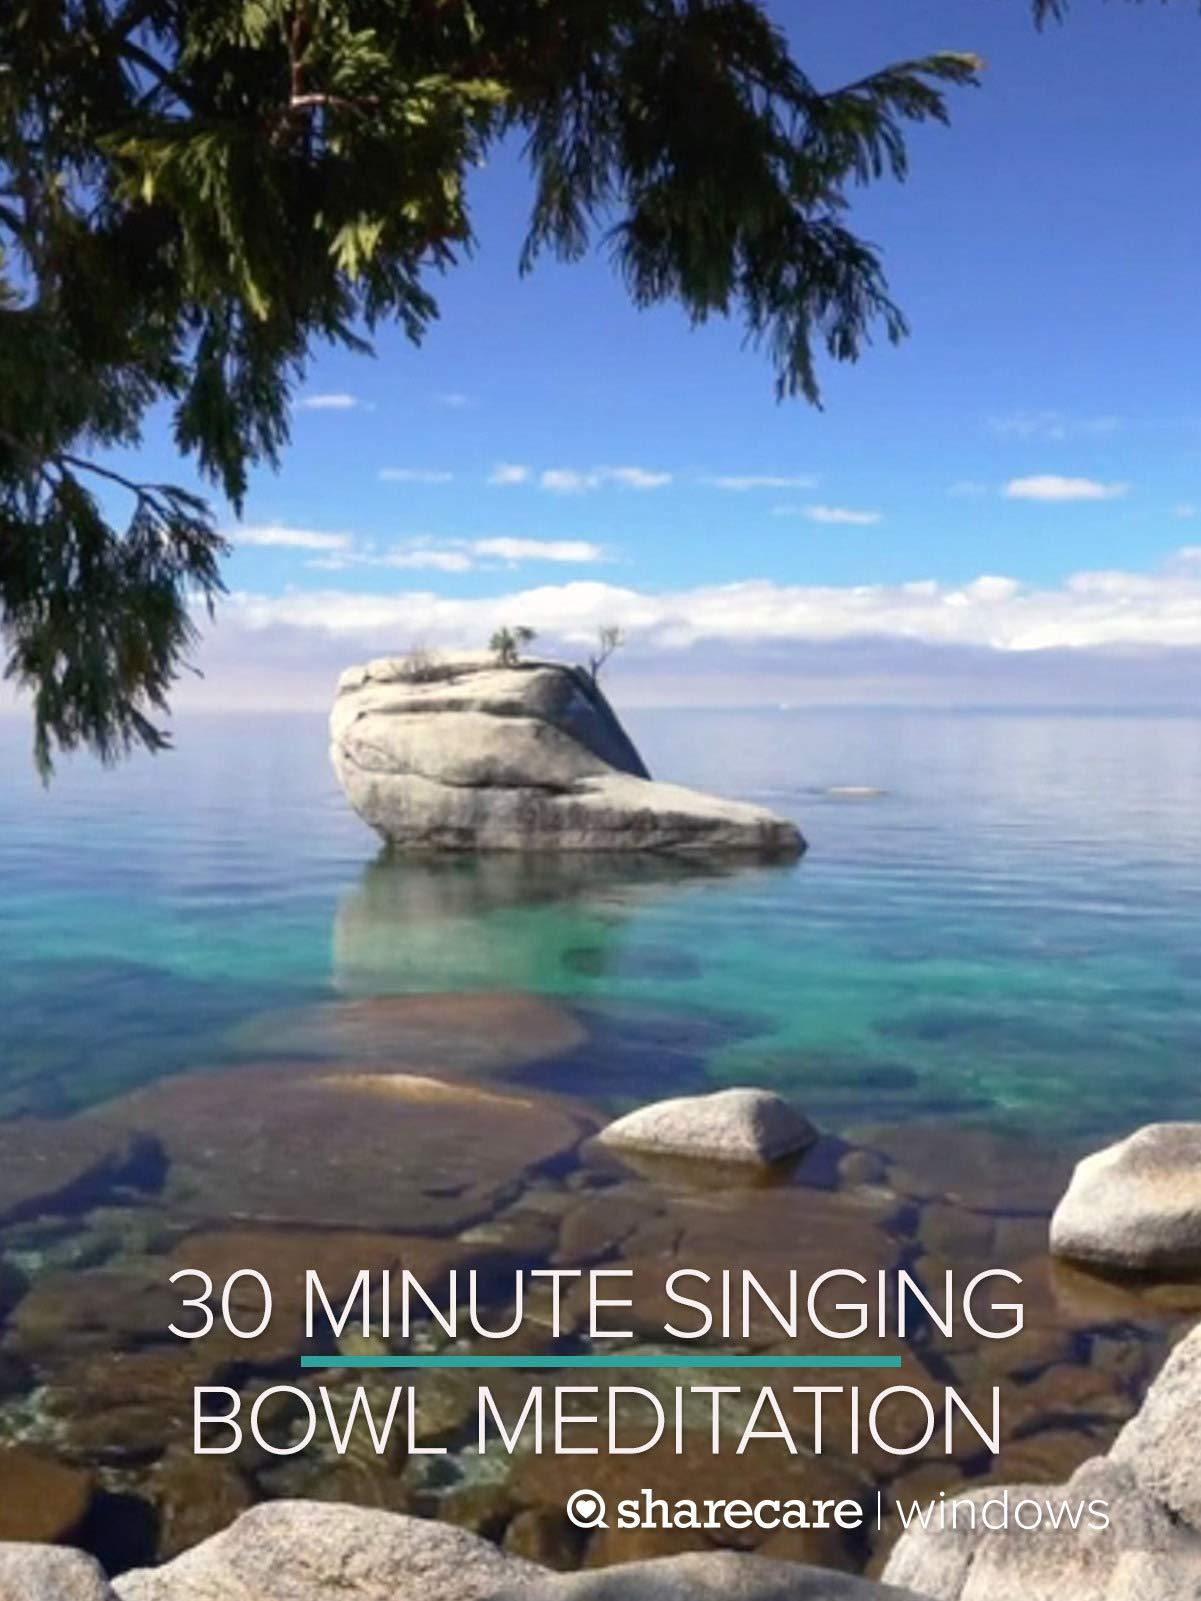 30 Minute Singing Bowl Meditation